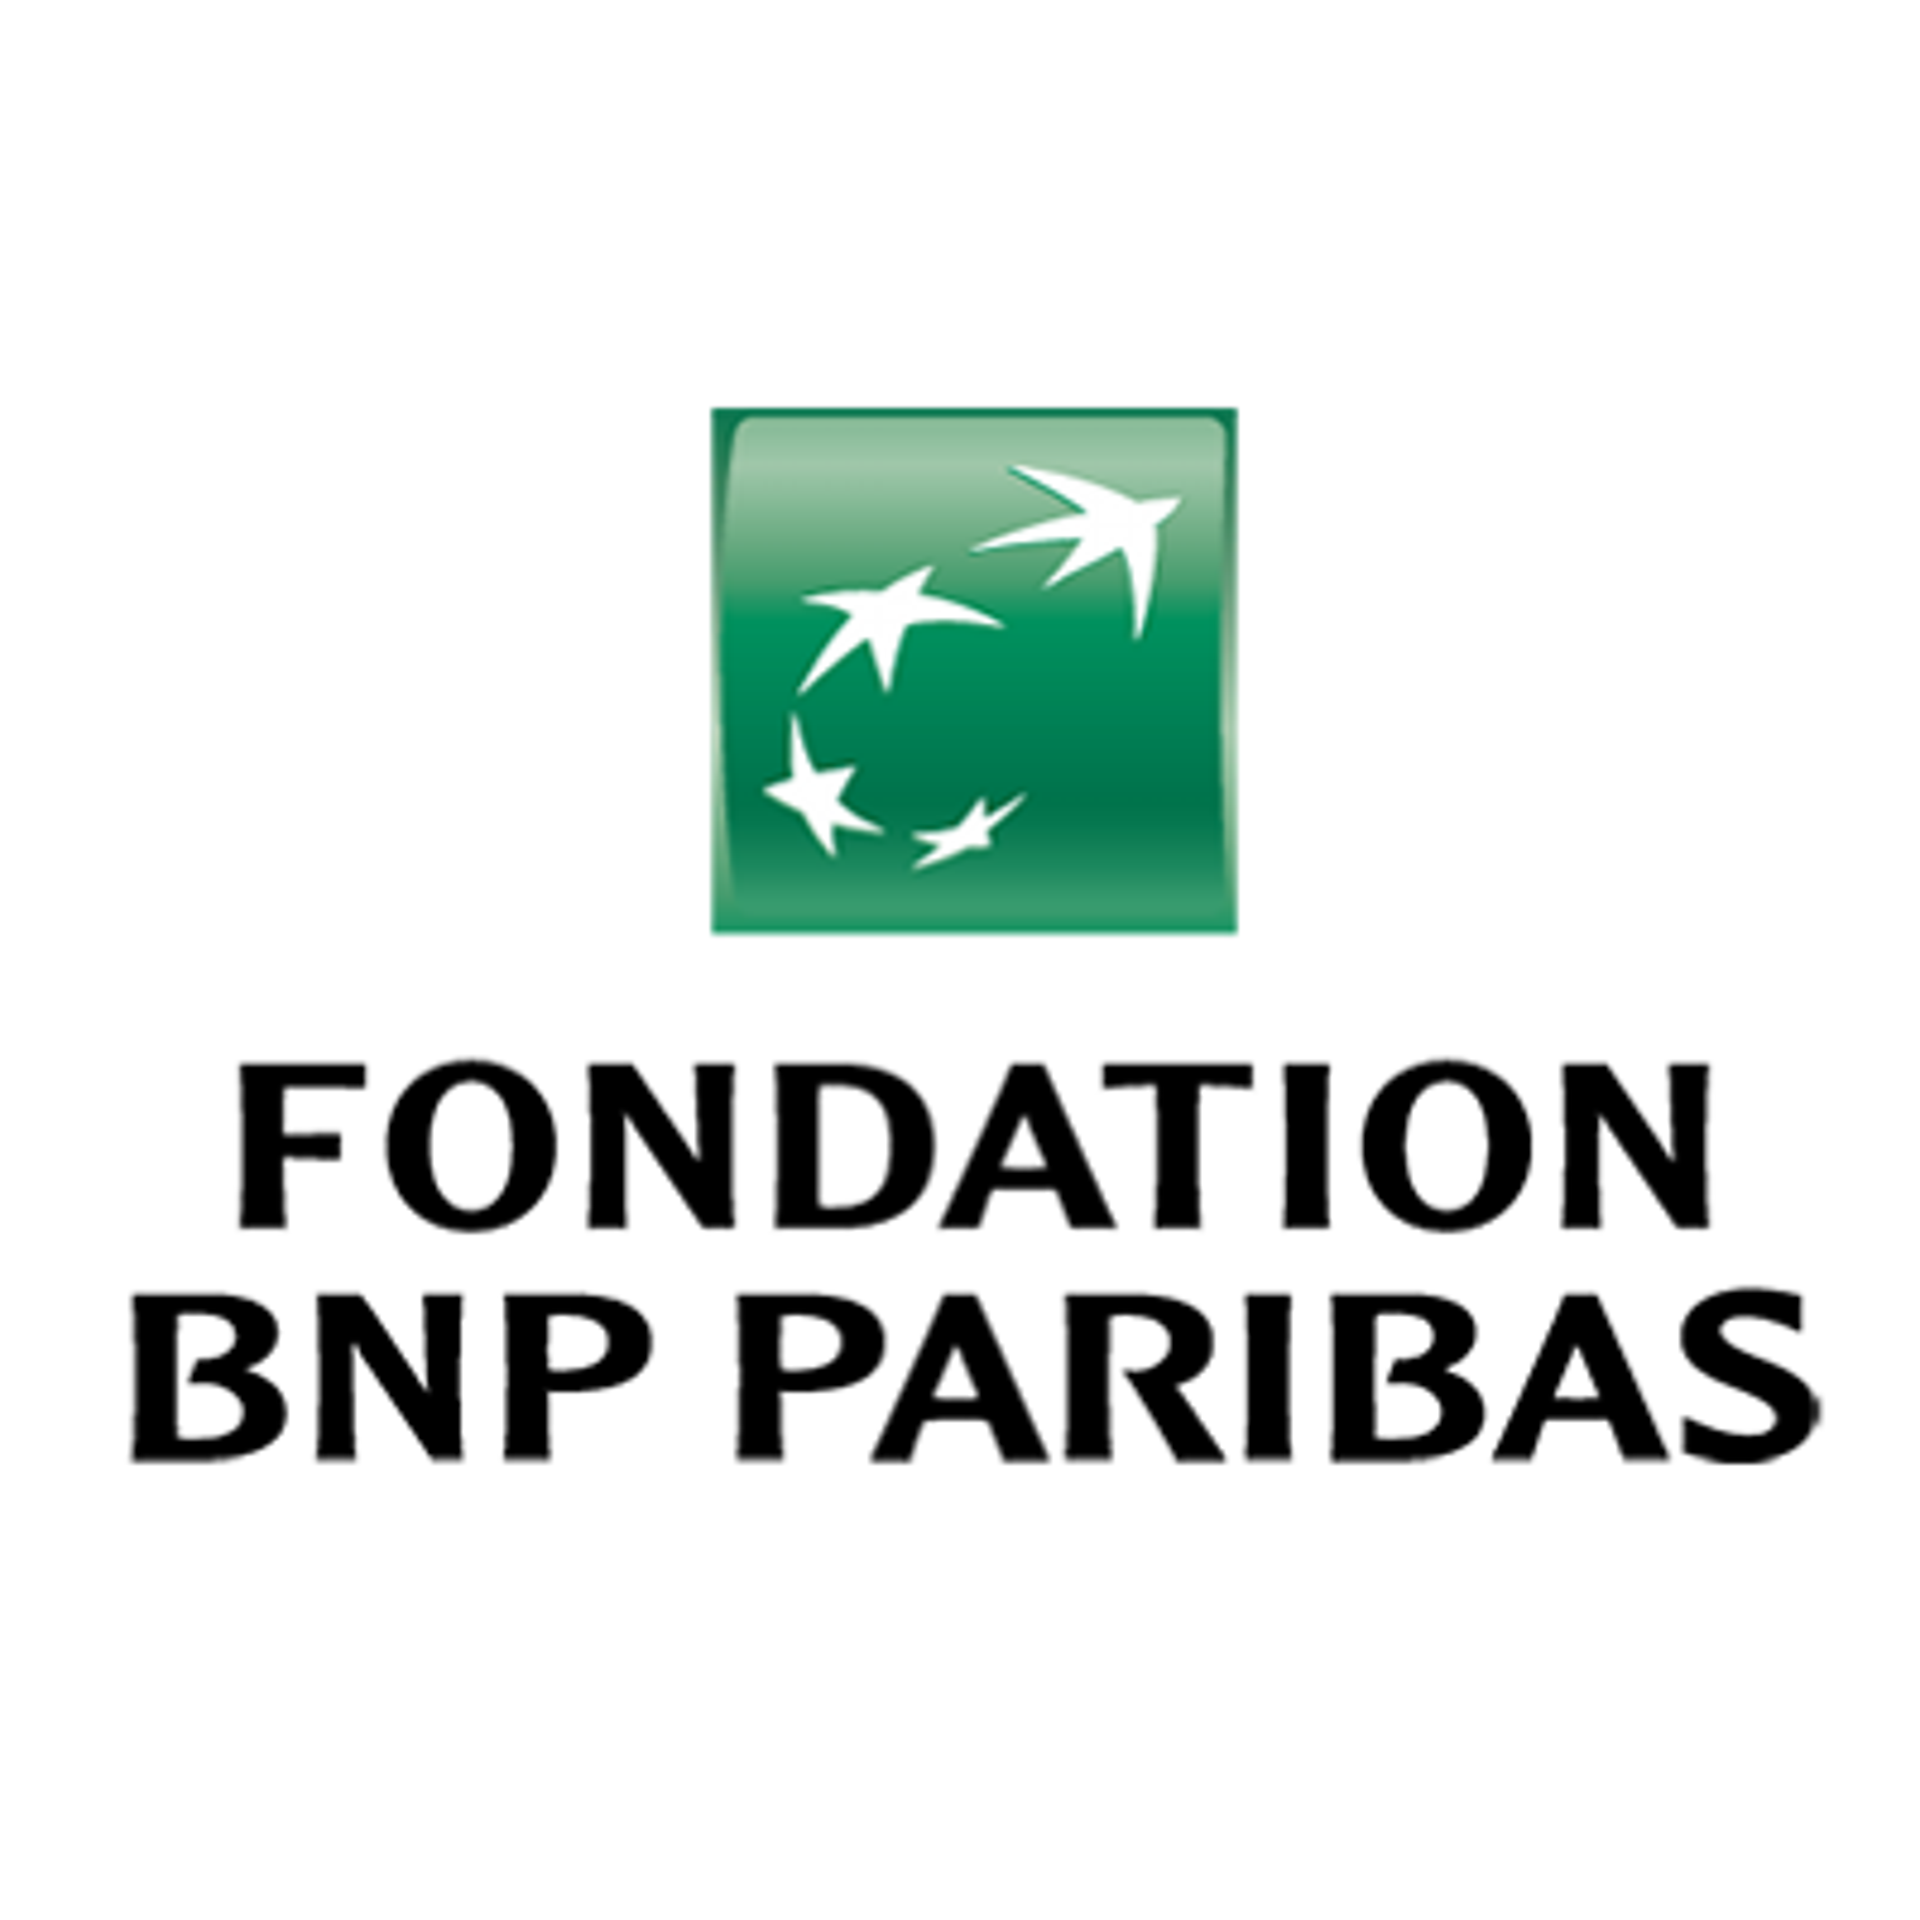 Logo 1522069675.png?ixlib=rb 1.1